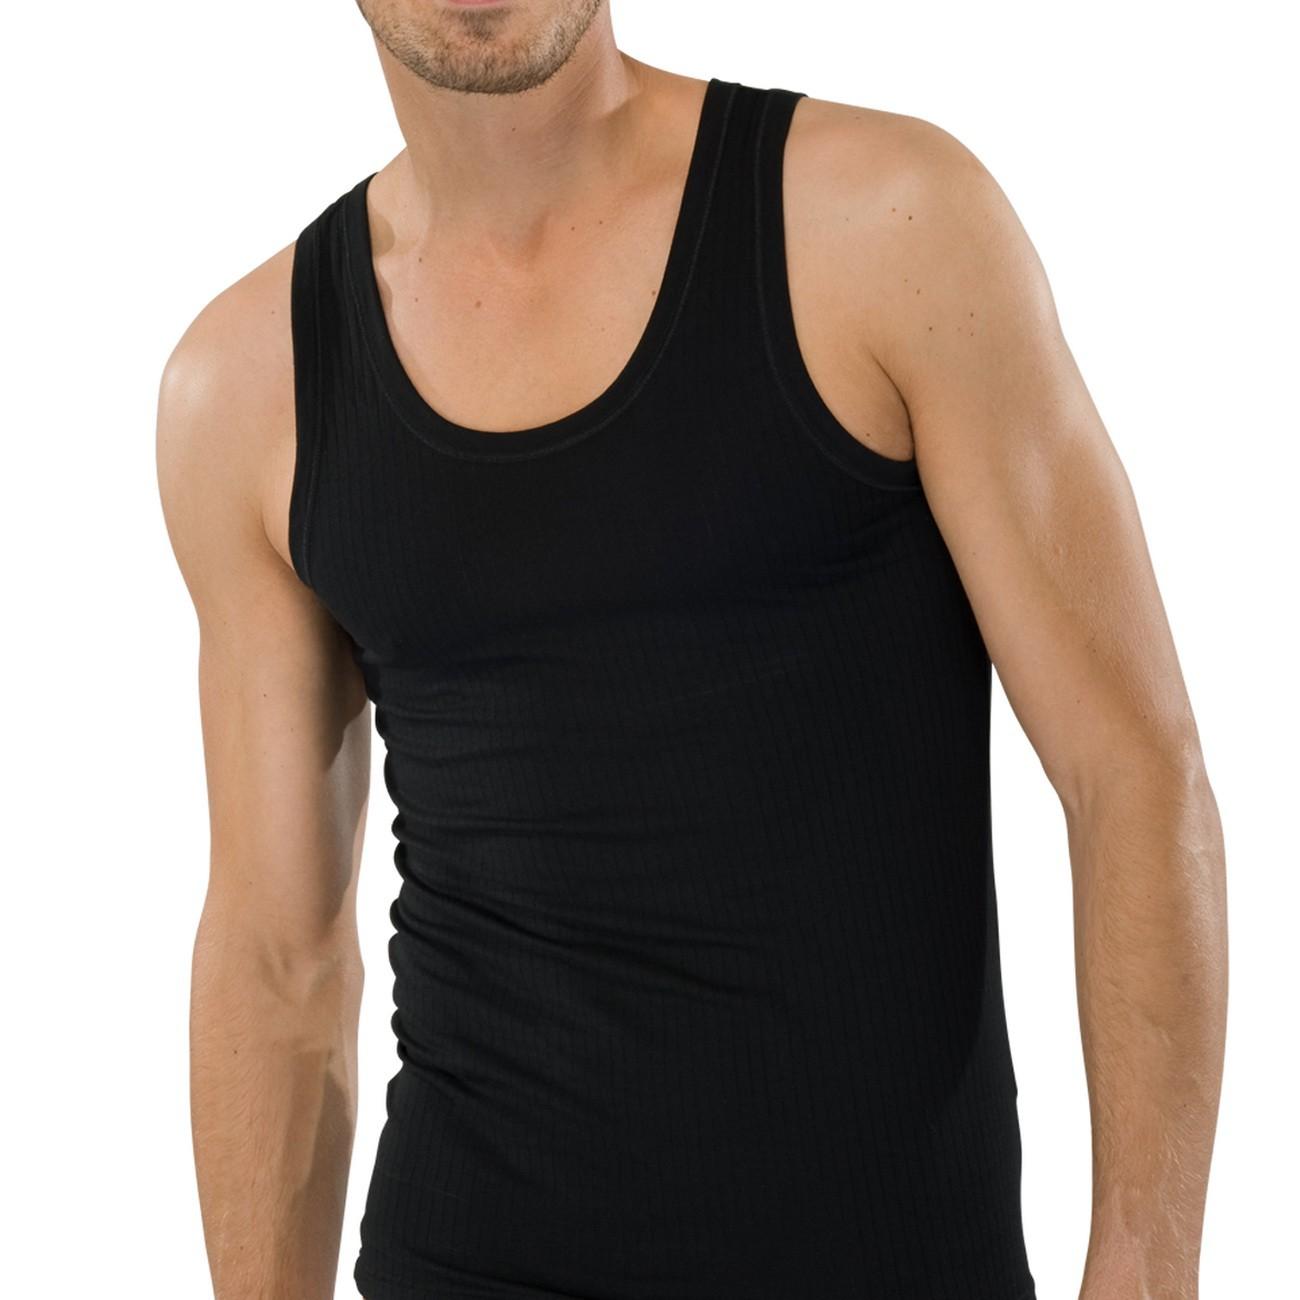 on sale 9b634 c6d3b SCHIESSER Herren Achsel-Shirt Authentic 2er Pack